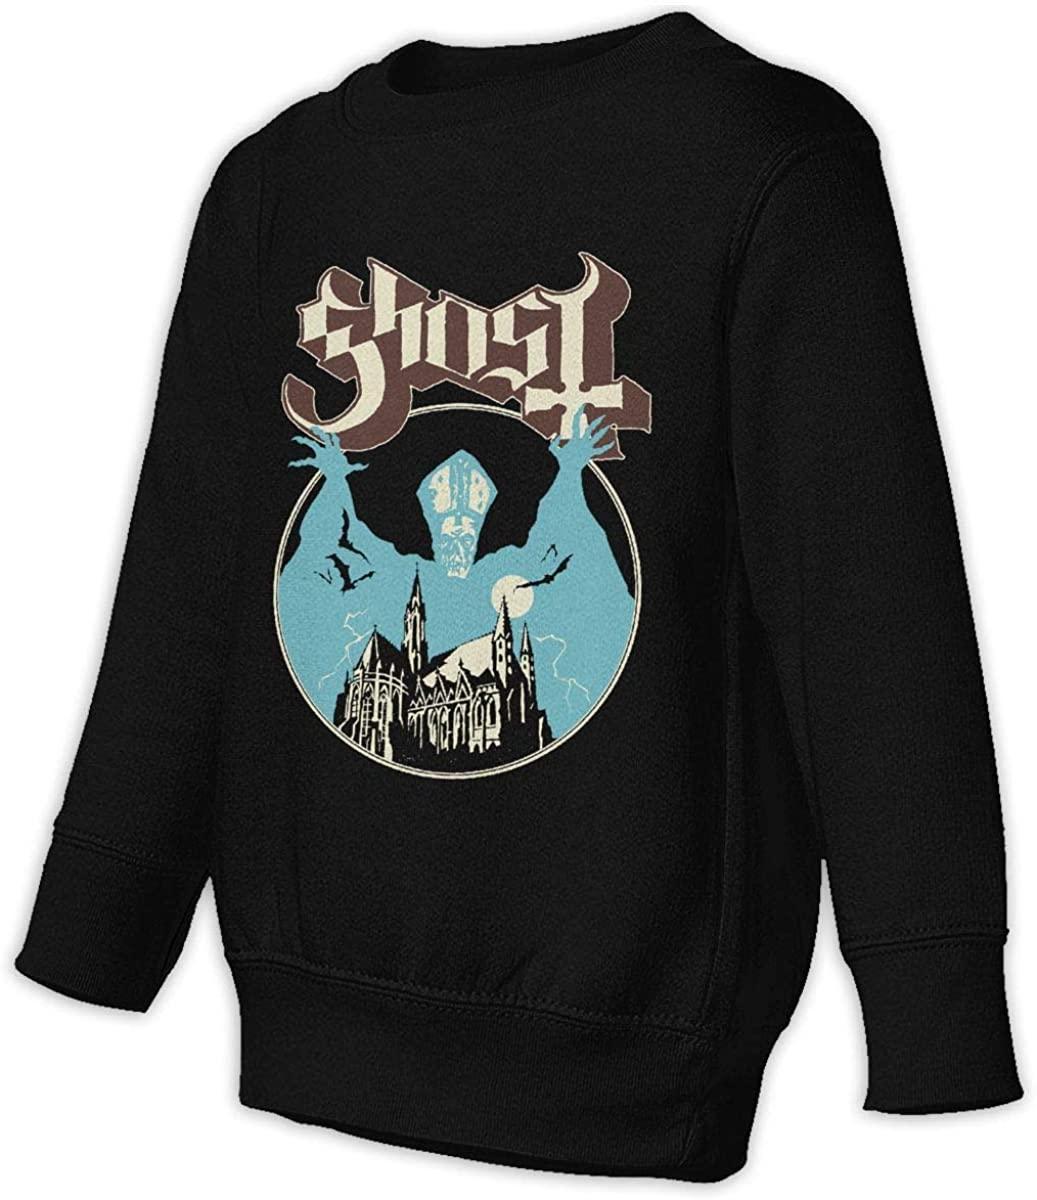 ASIUHAW Ghost Meliora Unisex Sweatshirt Youth Boy and Girls Pullover Sweatshirt